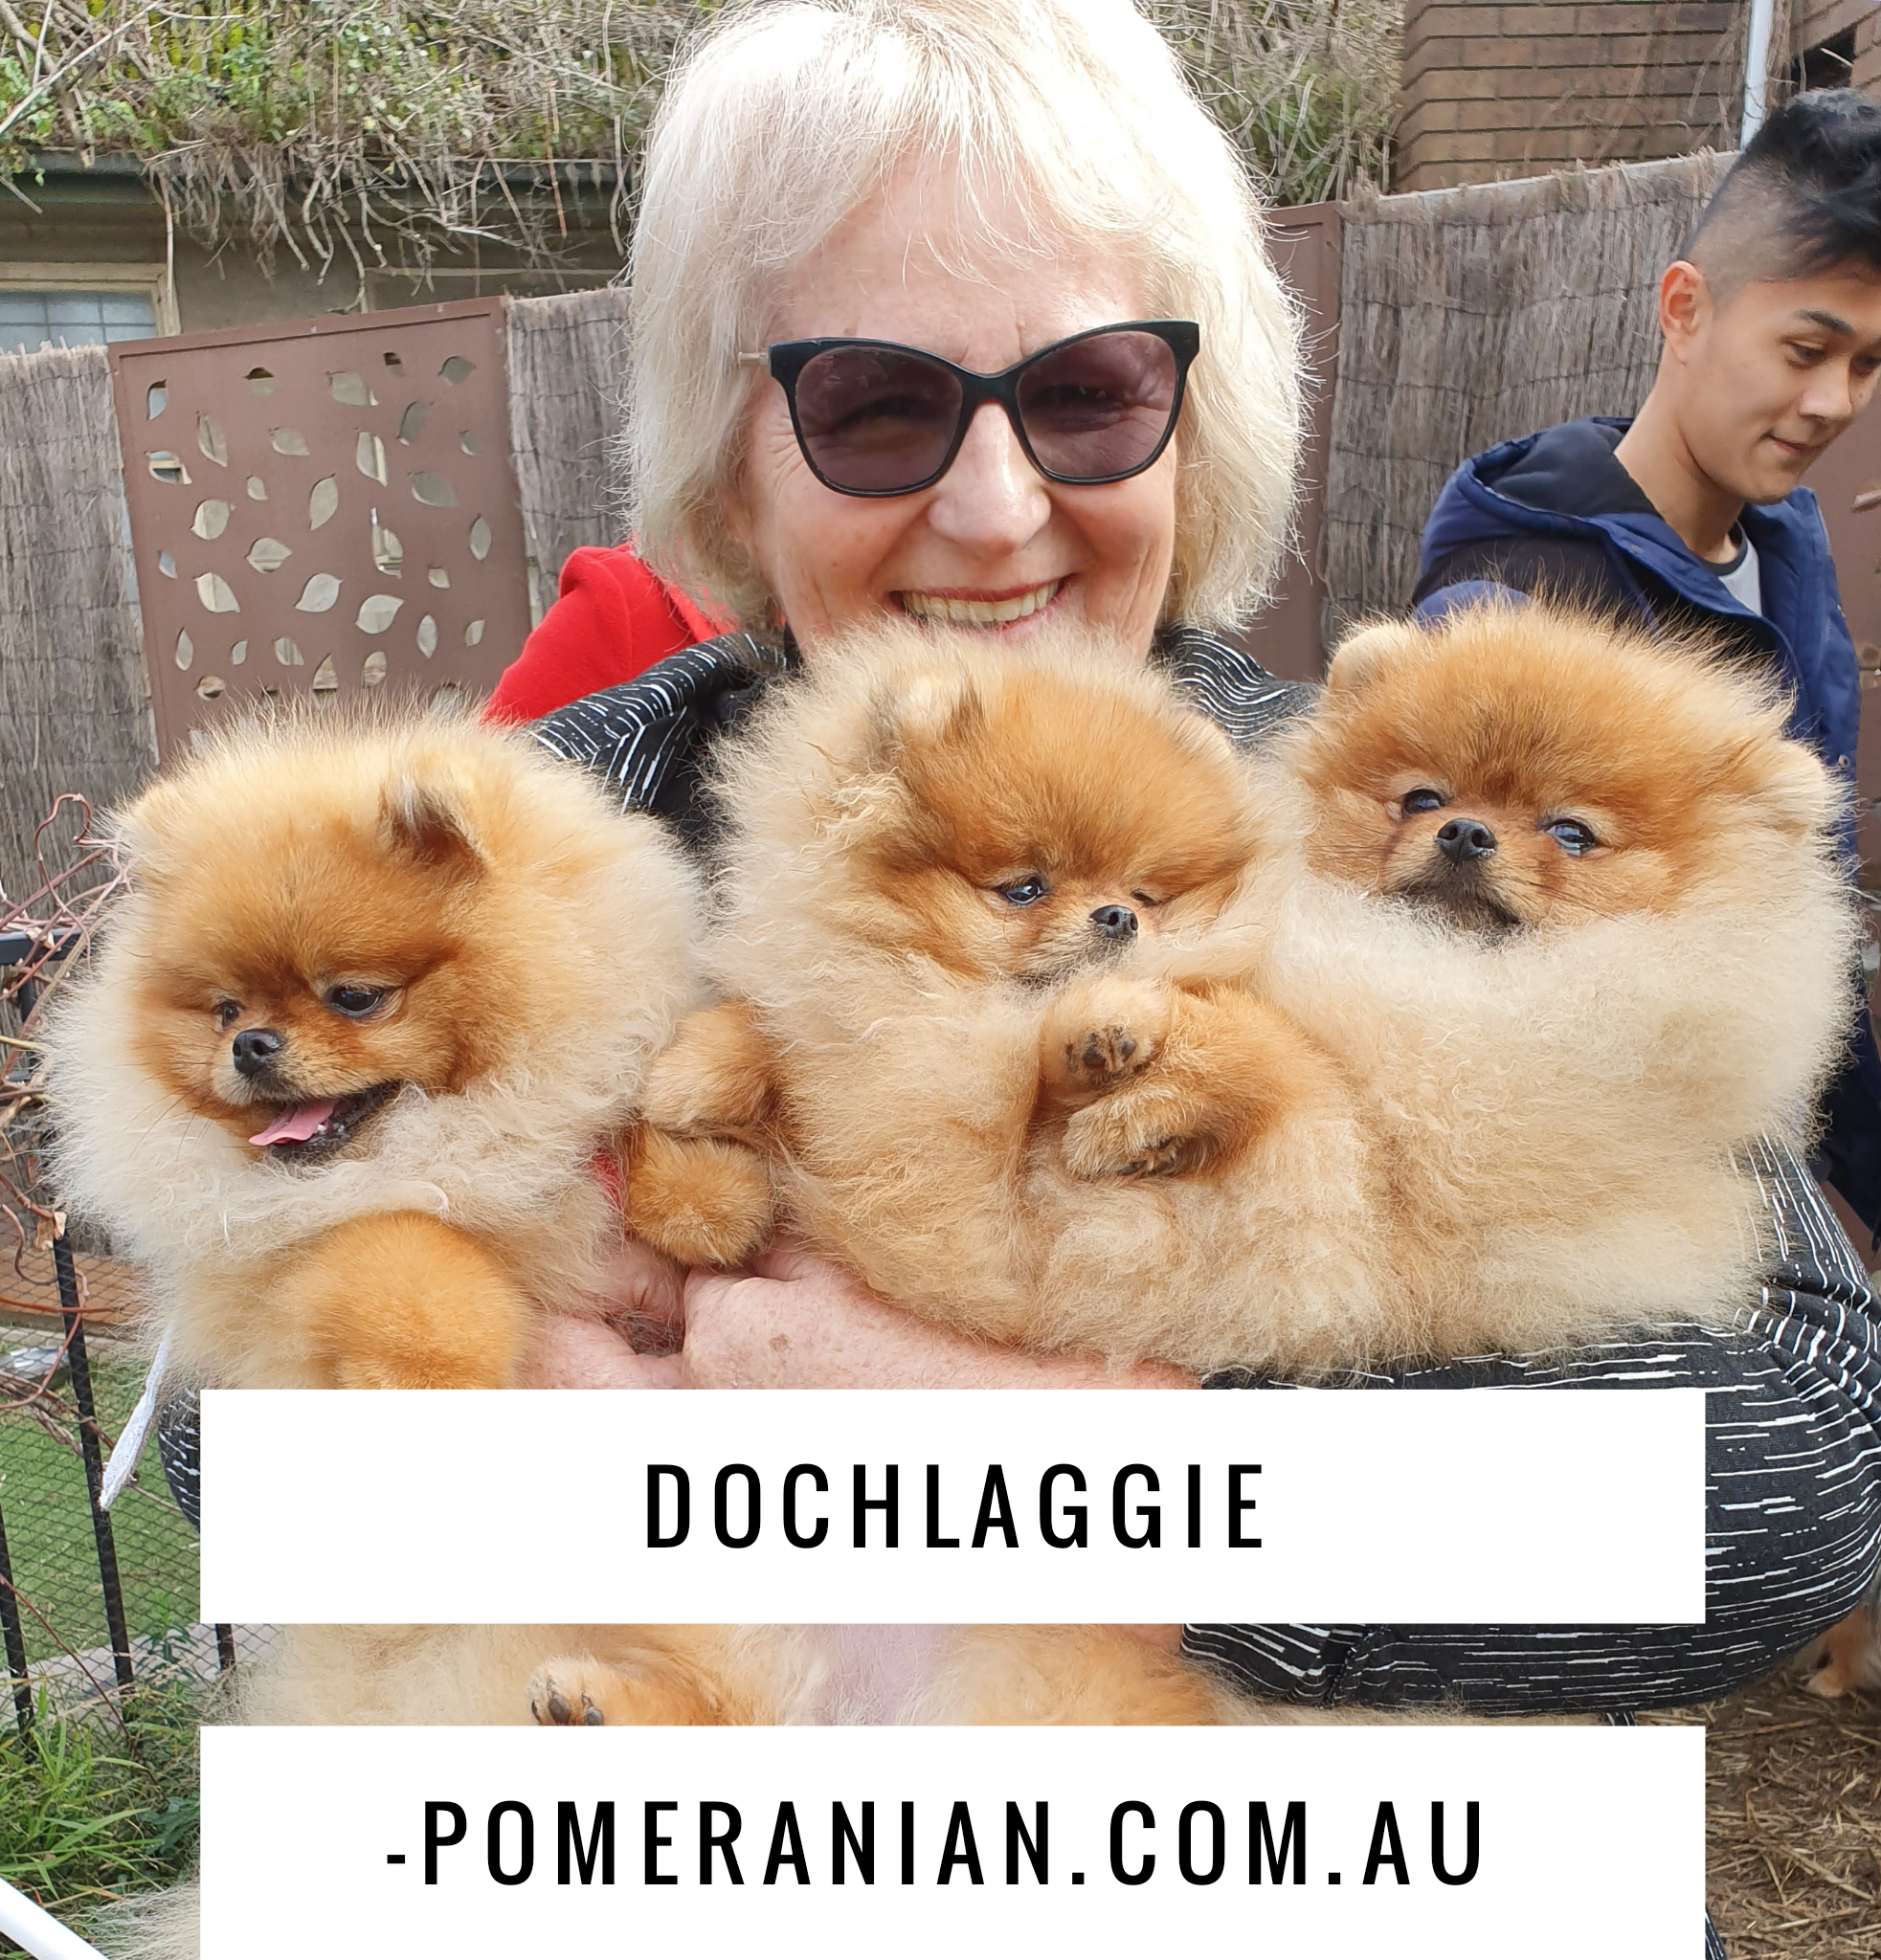 Dochlaggie Pomeranians Melbourne Australia In 2020 Pomeranian Puppy Puppies Pomeranian